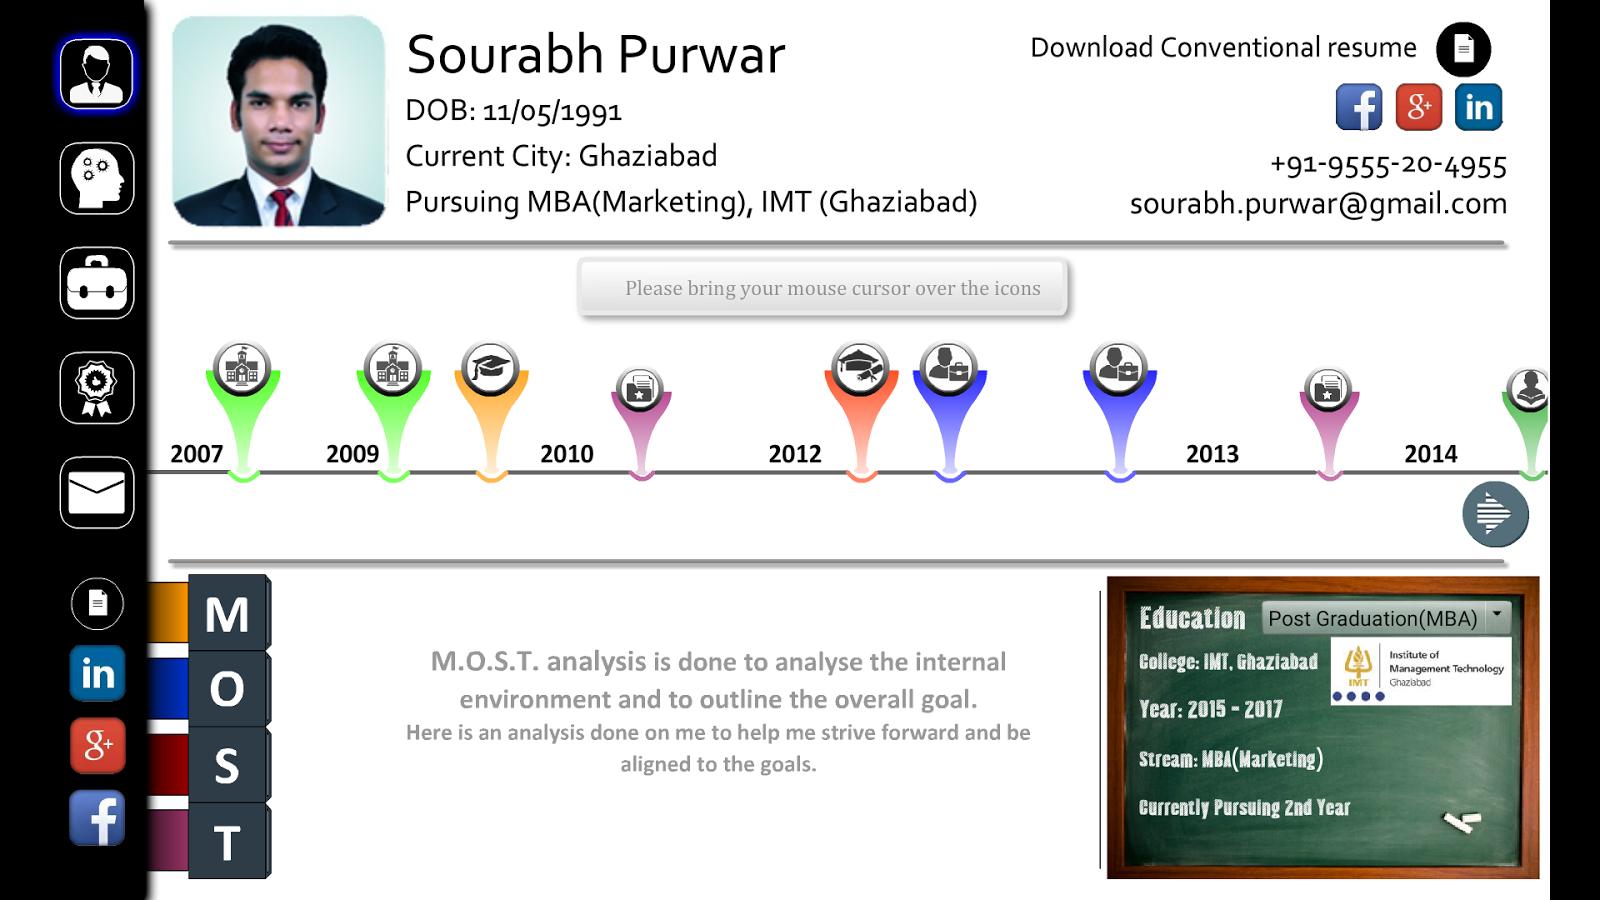 interactive resume sourabh p screenshot - Interactive Resume